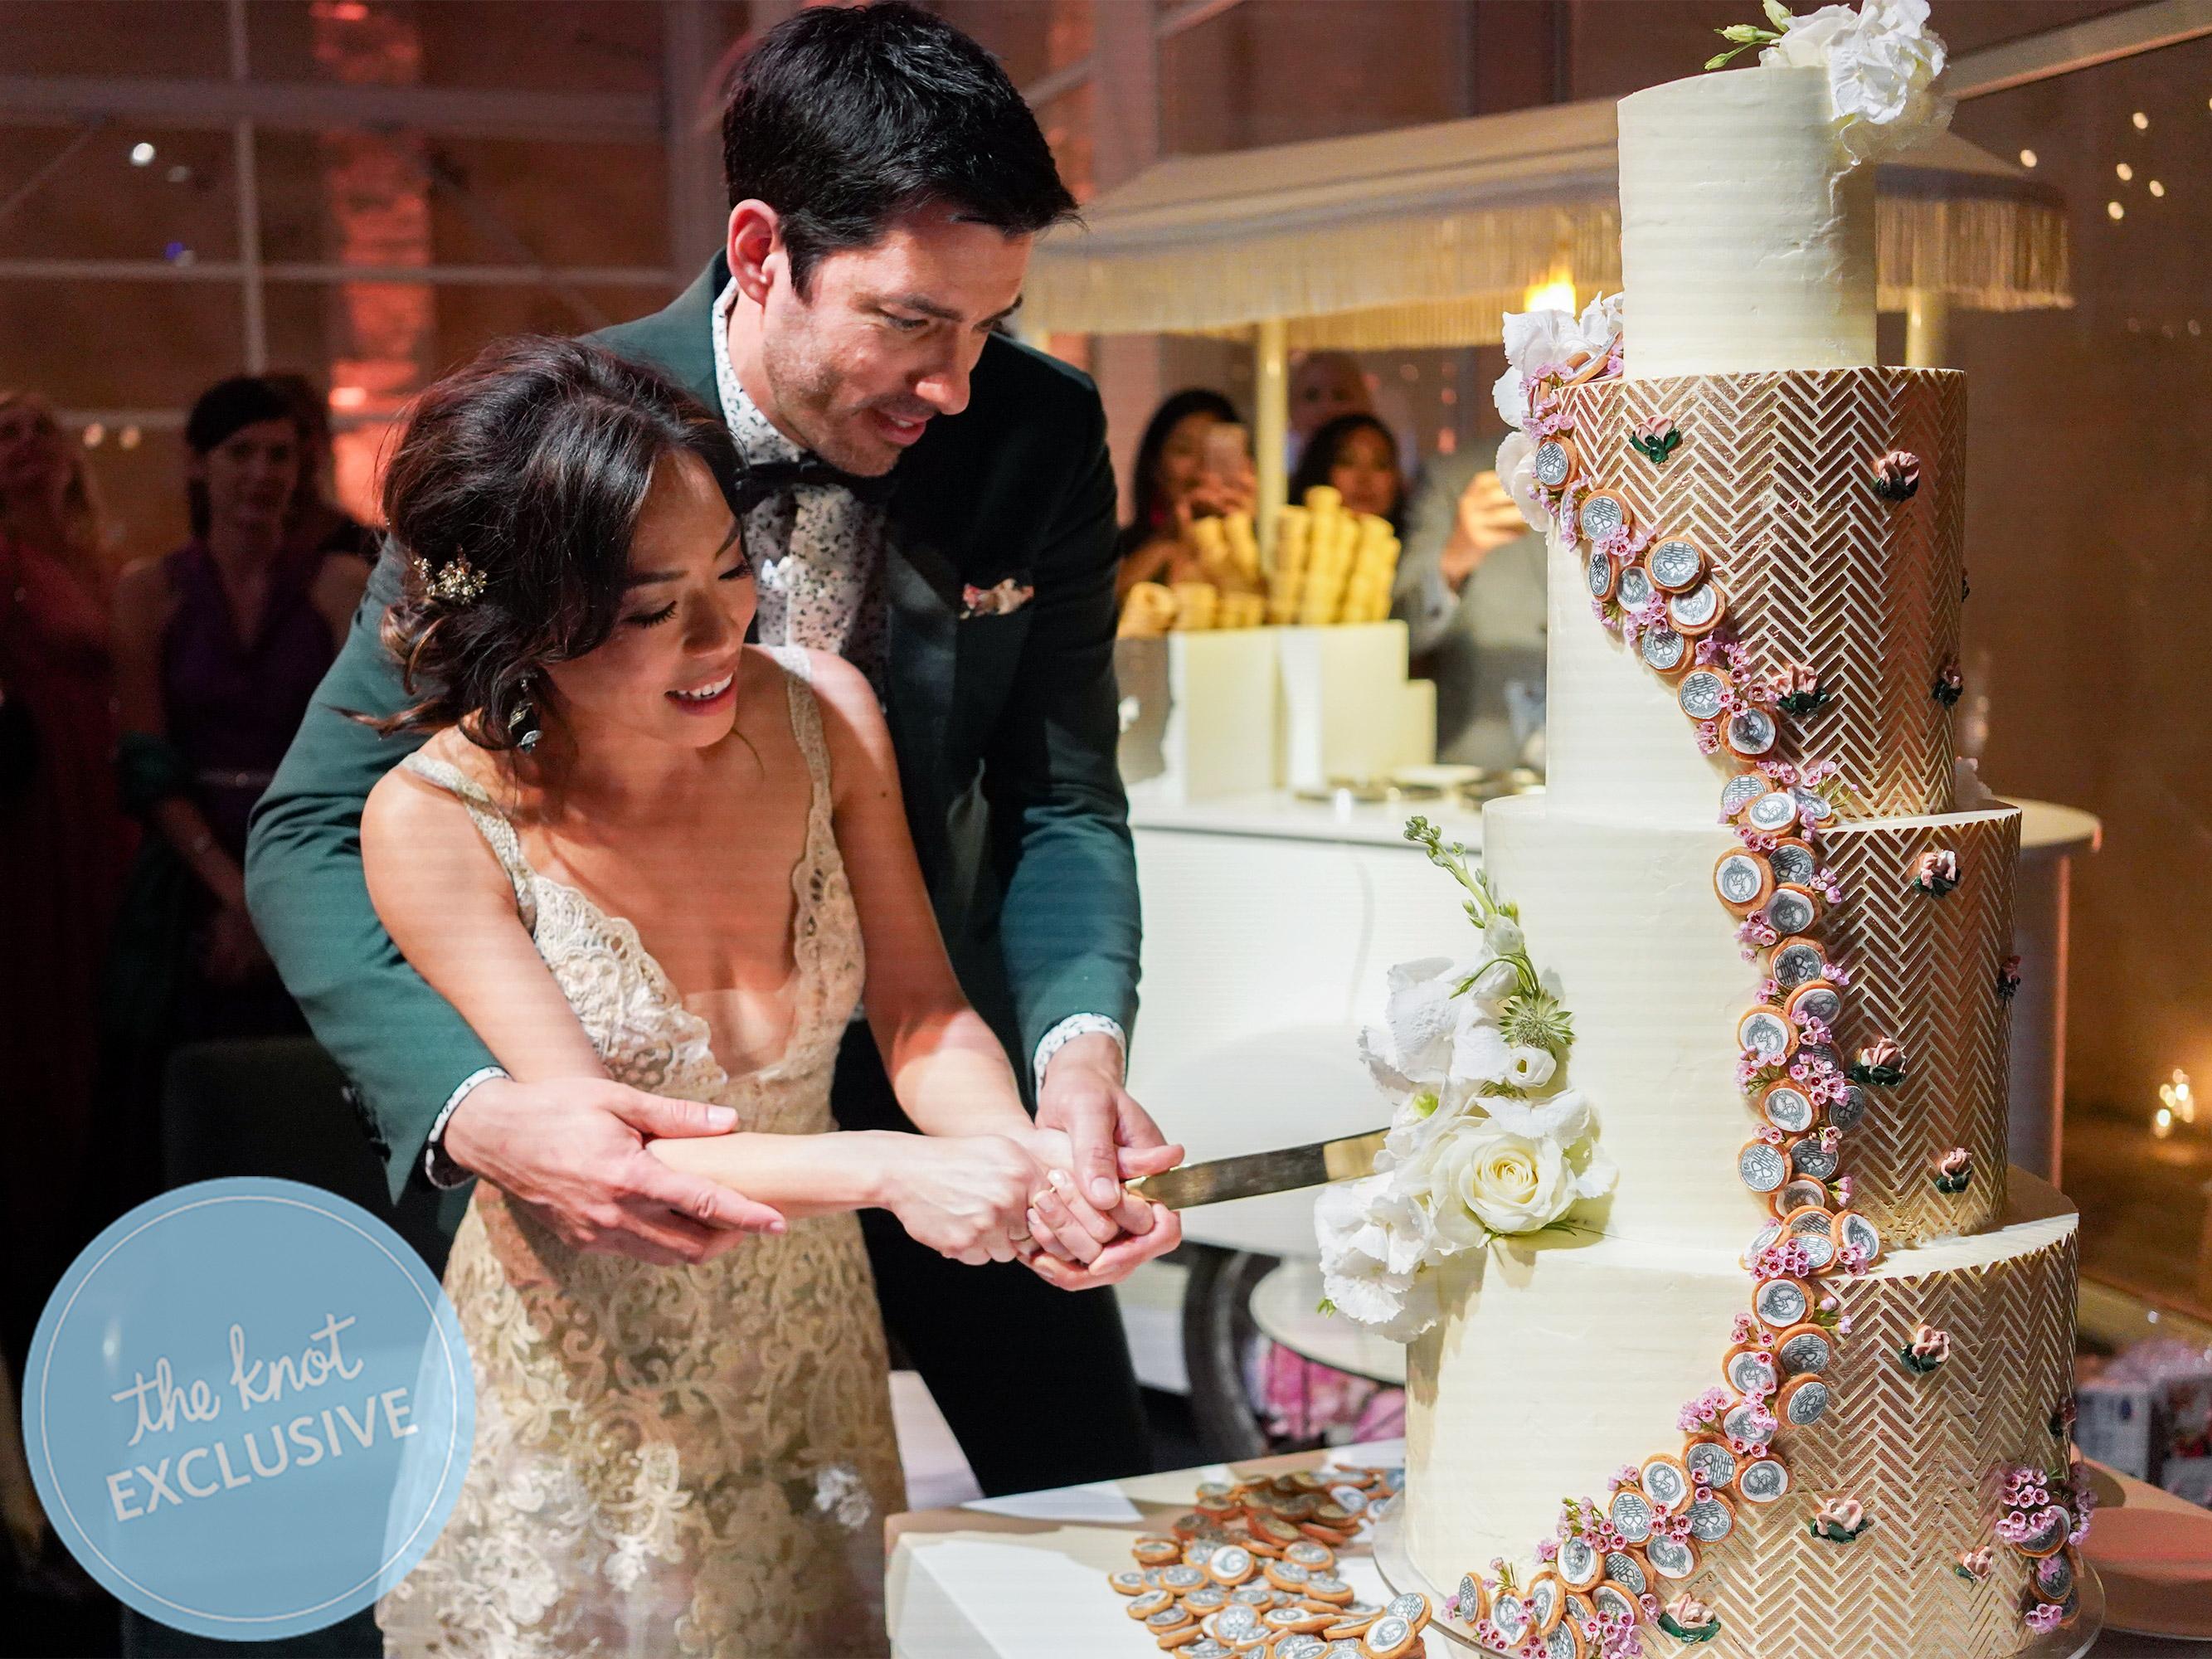 Drew Scott And Linda Phan Wedding May 2018 Italy Credit Jessica Earnshaw